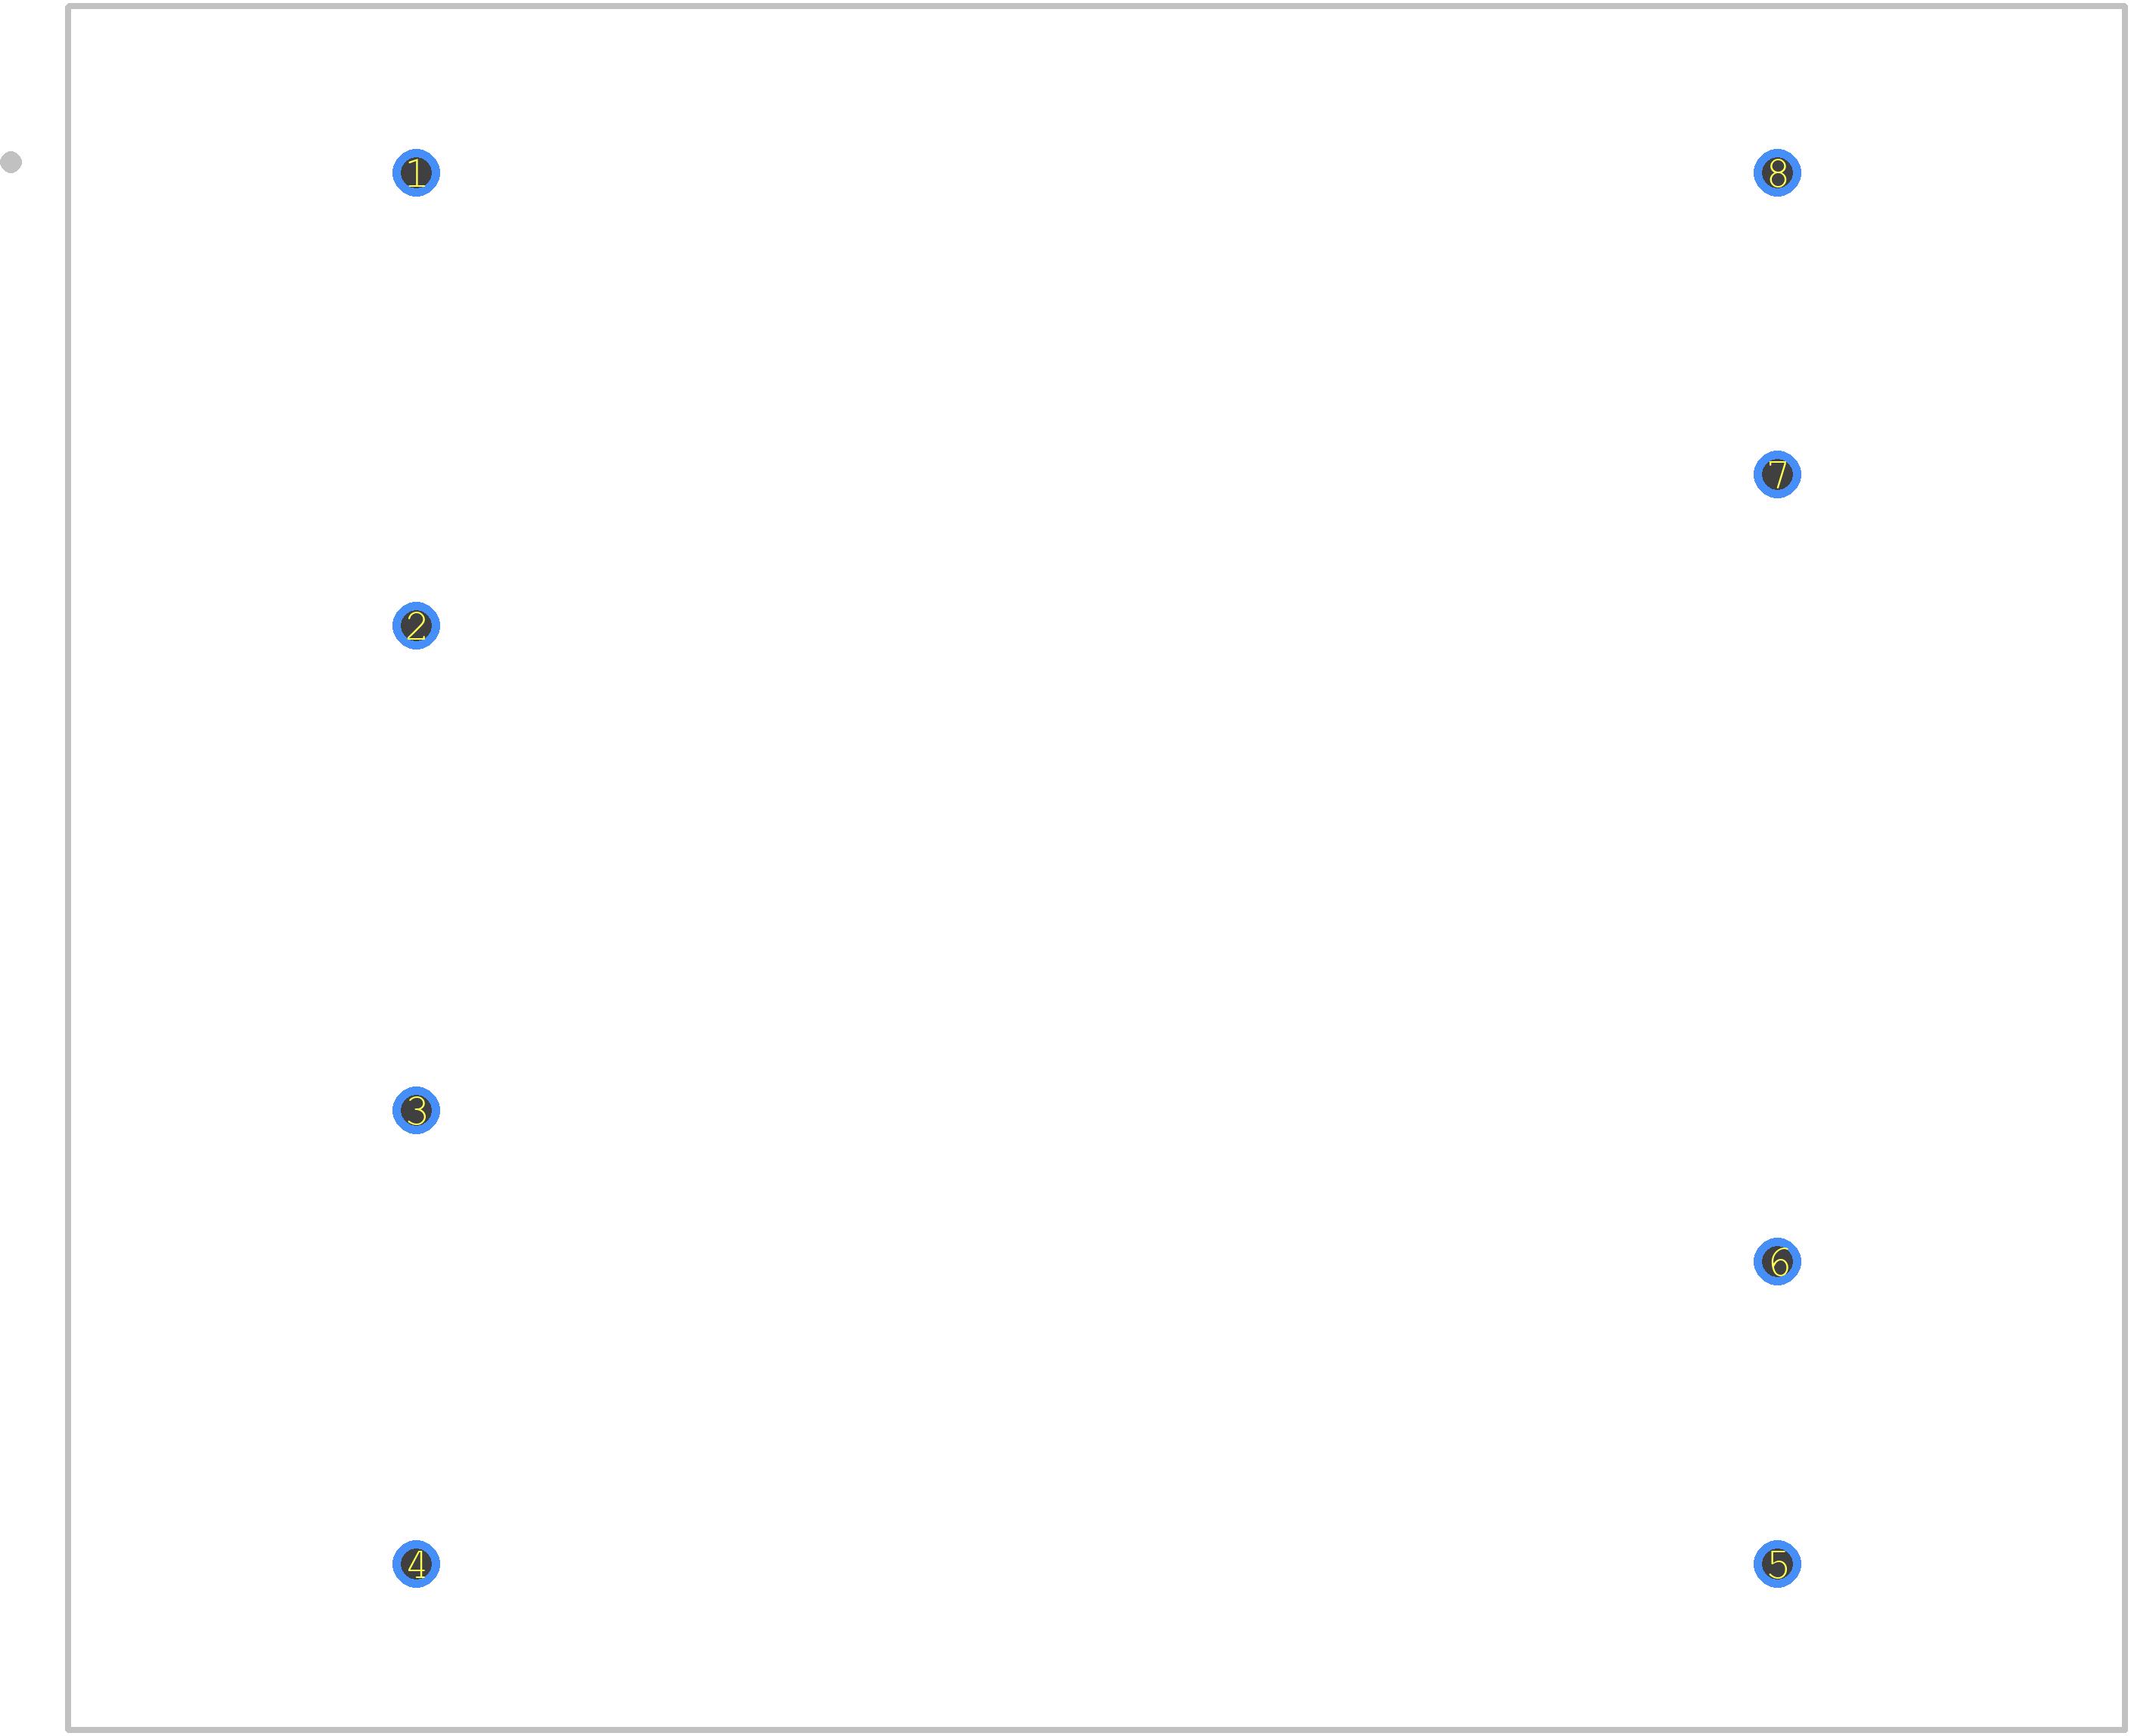 FL30/18 - BLOCK - PCB Footprint & Symbol Download